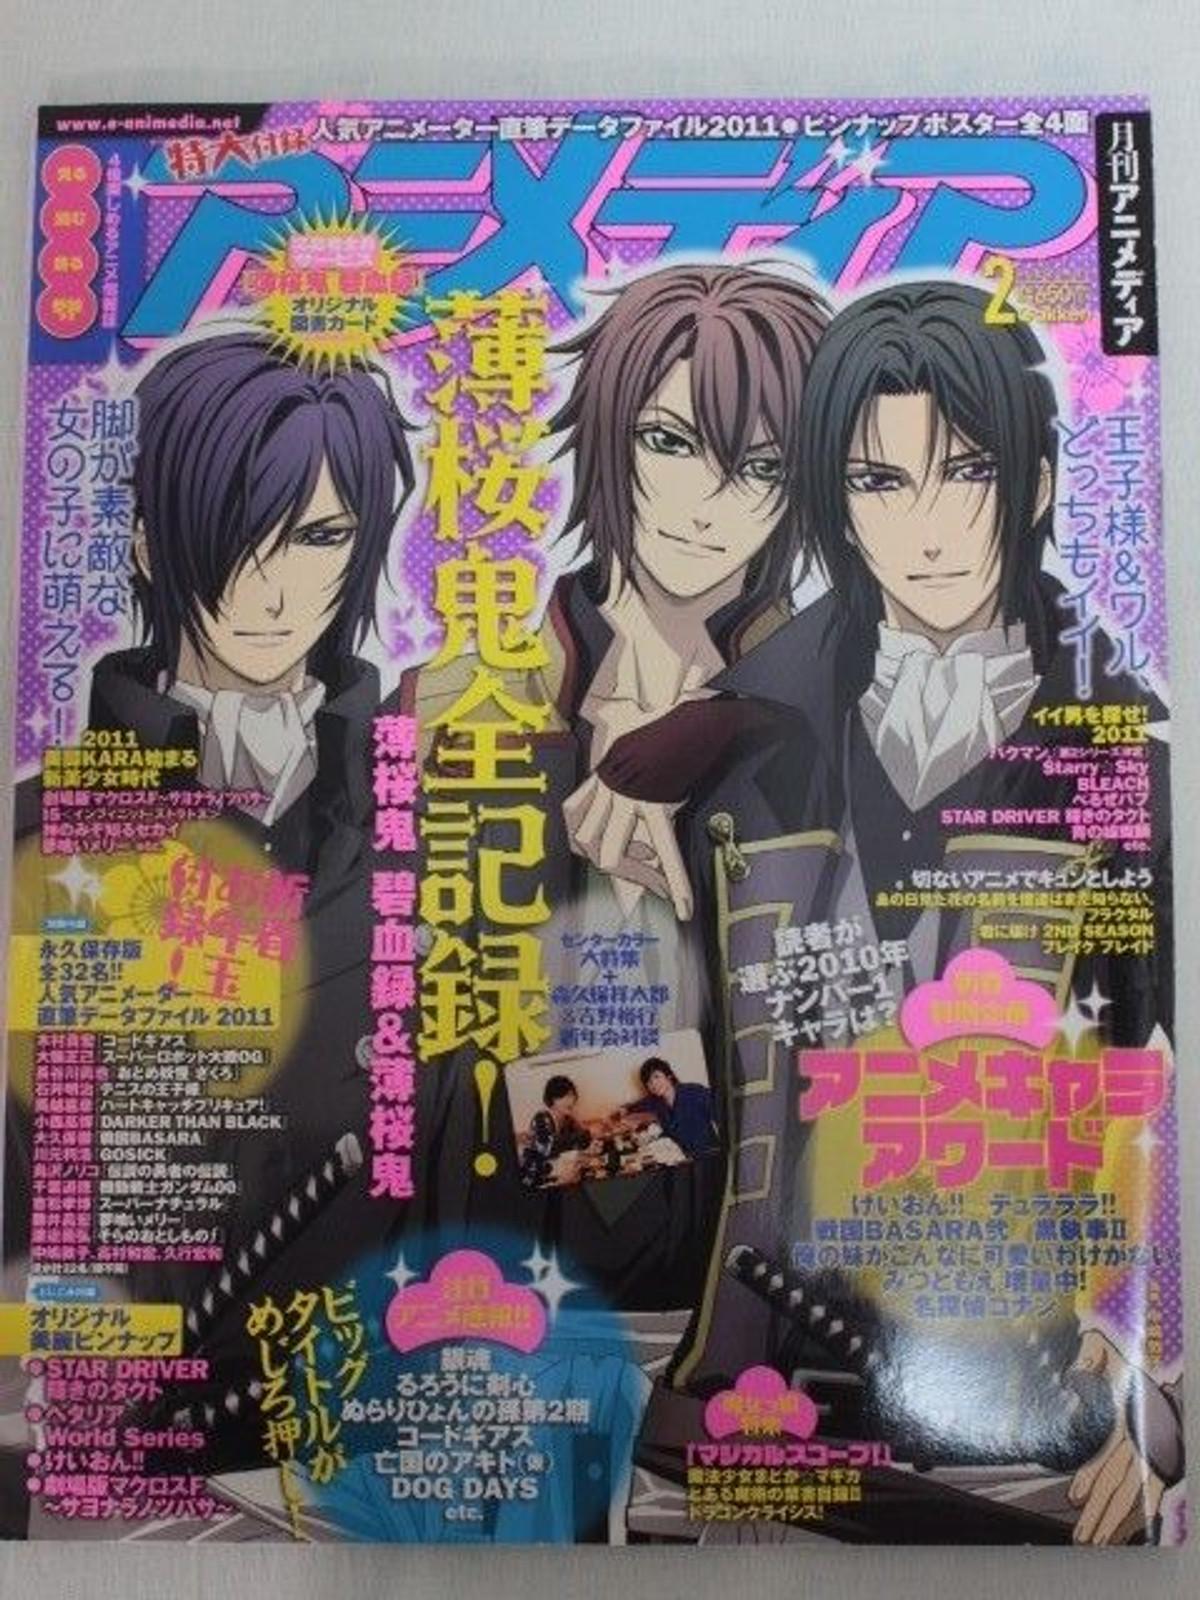 Animedia Japan Anime Magazine 02/2011 Gakken / HAKUOUKI/MACROSS/STAR DRIVER//K-ON/BASARA